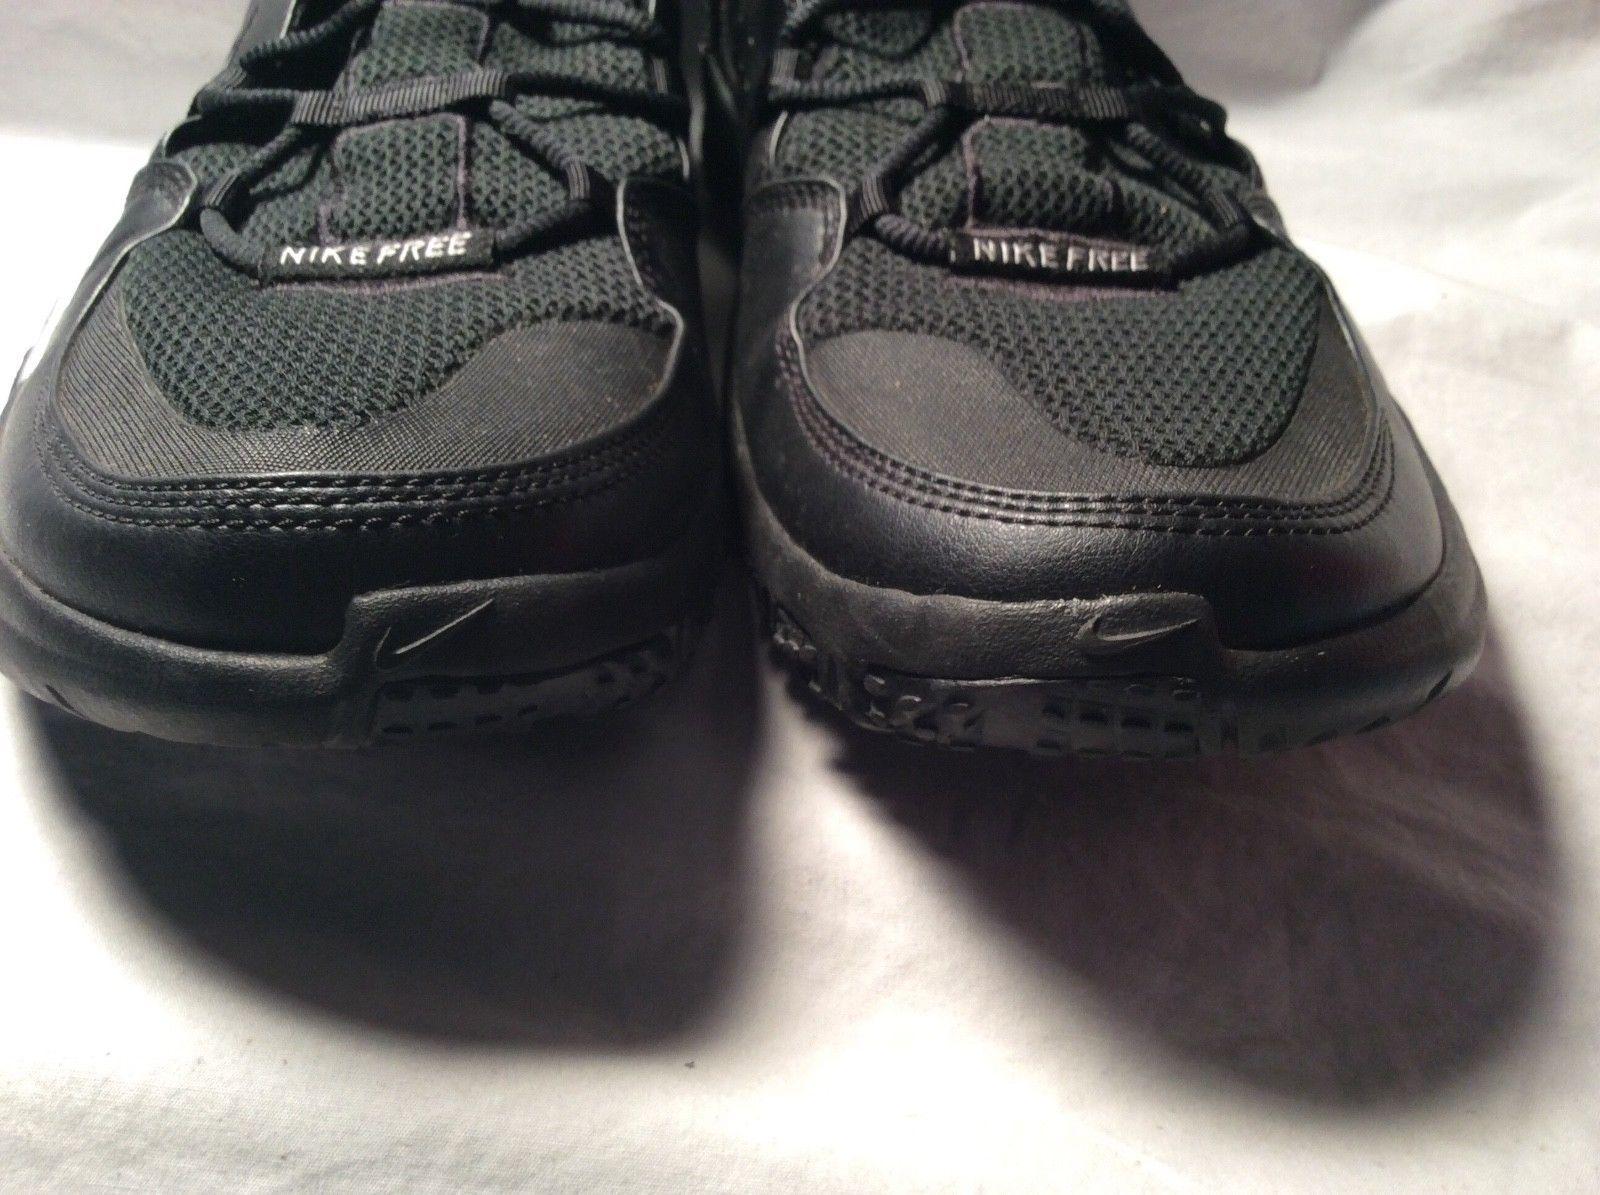 Retro Nike Air Free SPARQ Training Flyknit DSX Size 10